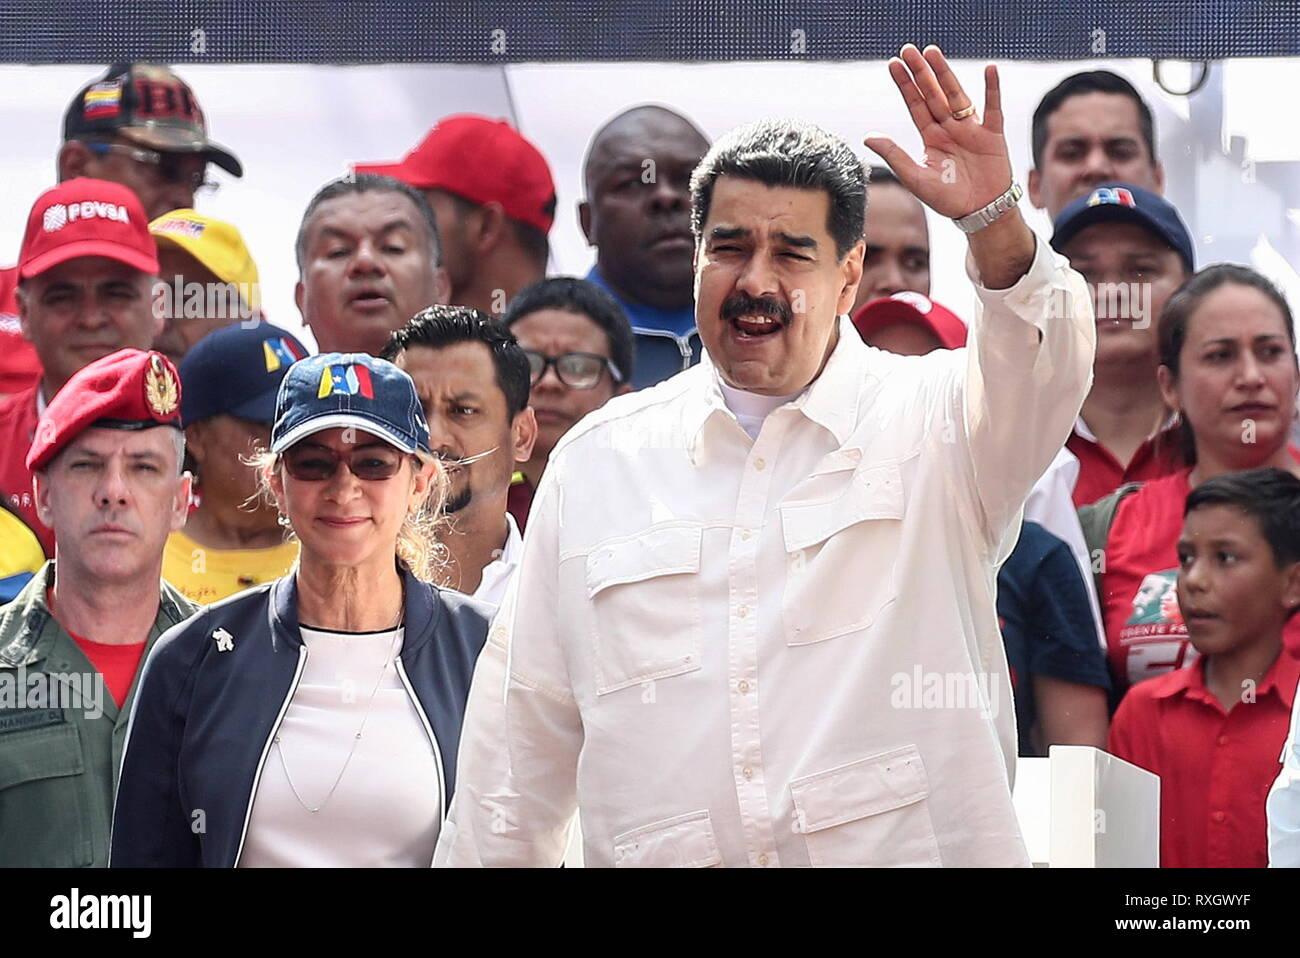 Caracas, Venezuela. 09th Mar, 2019. CARACAS, VENEZUELA - MARCH 10, 2019: Venezuela's President Nicolas Maduro (R) and his wife Cilia Flores during a rally marking Anti-imperialism Day. Valery Sharifulin/TASS Credit: ITAR-TASS News Agency/Alamy Live News - Stock Image